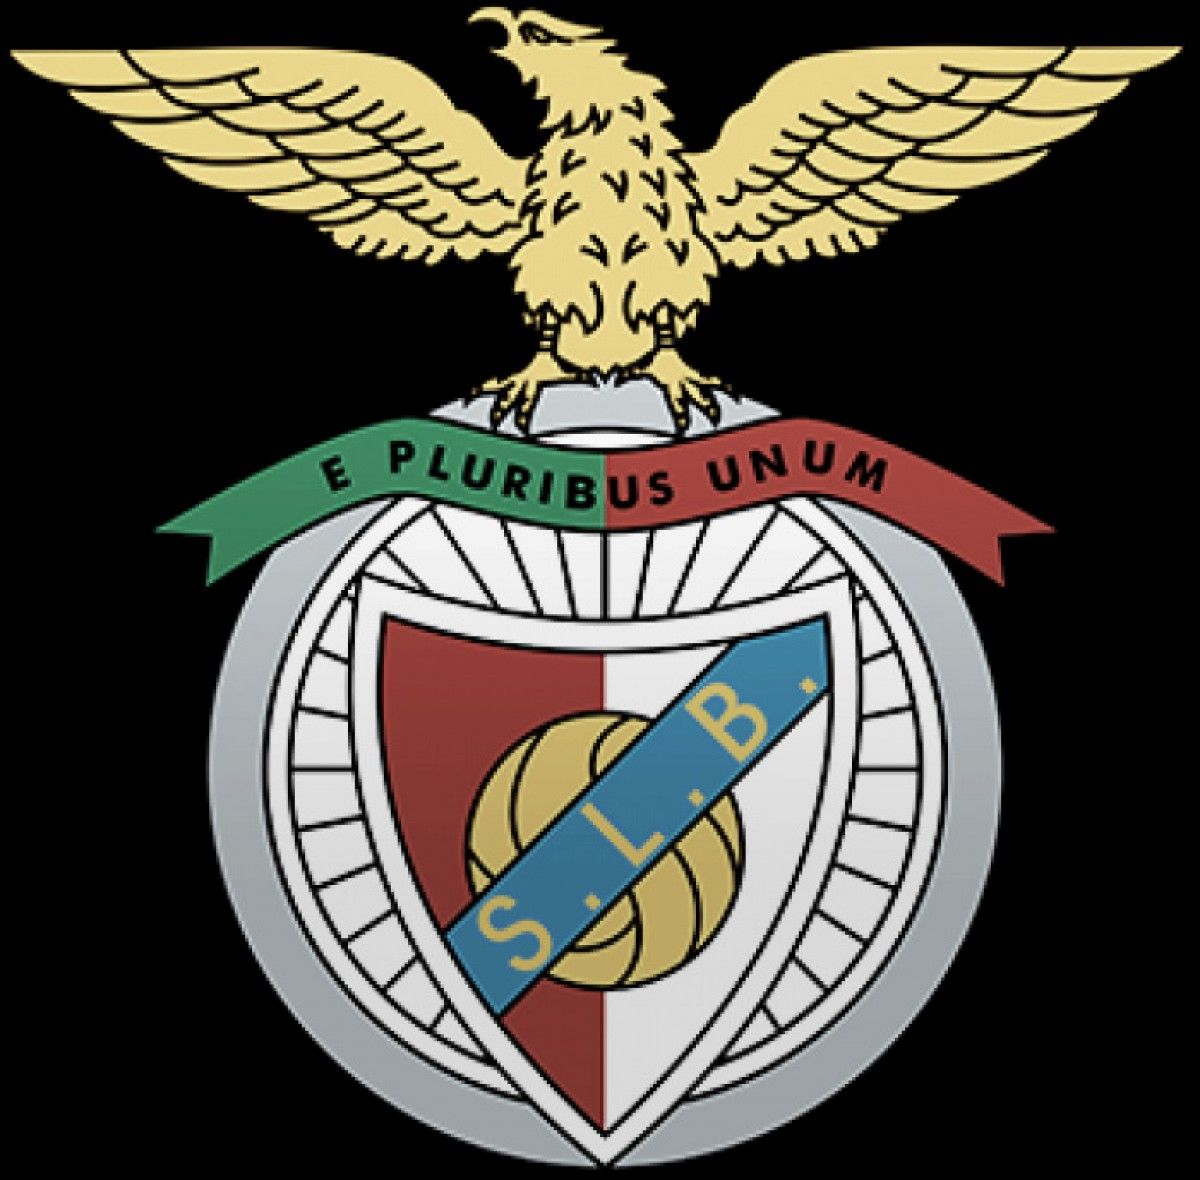 Especial: as cedências dos 3 grandes(André Carrillo, Lisandro López e Pedro Pereira)